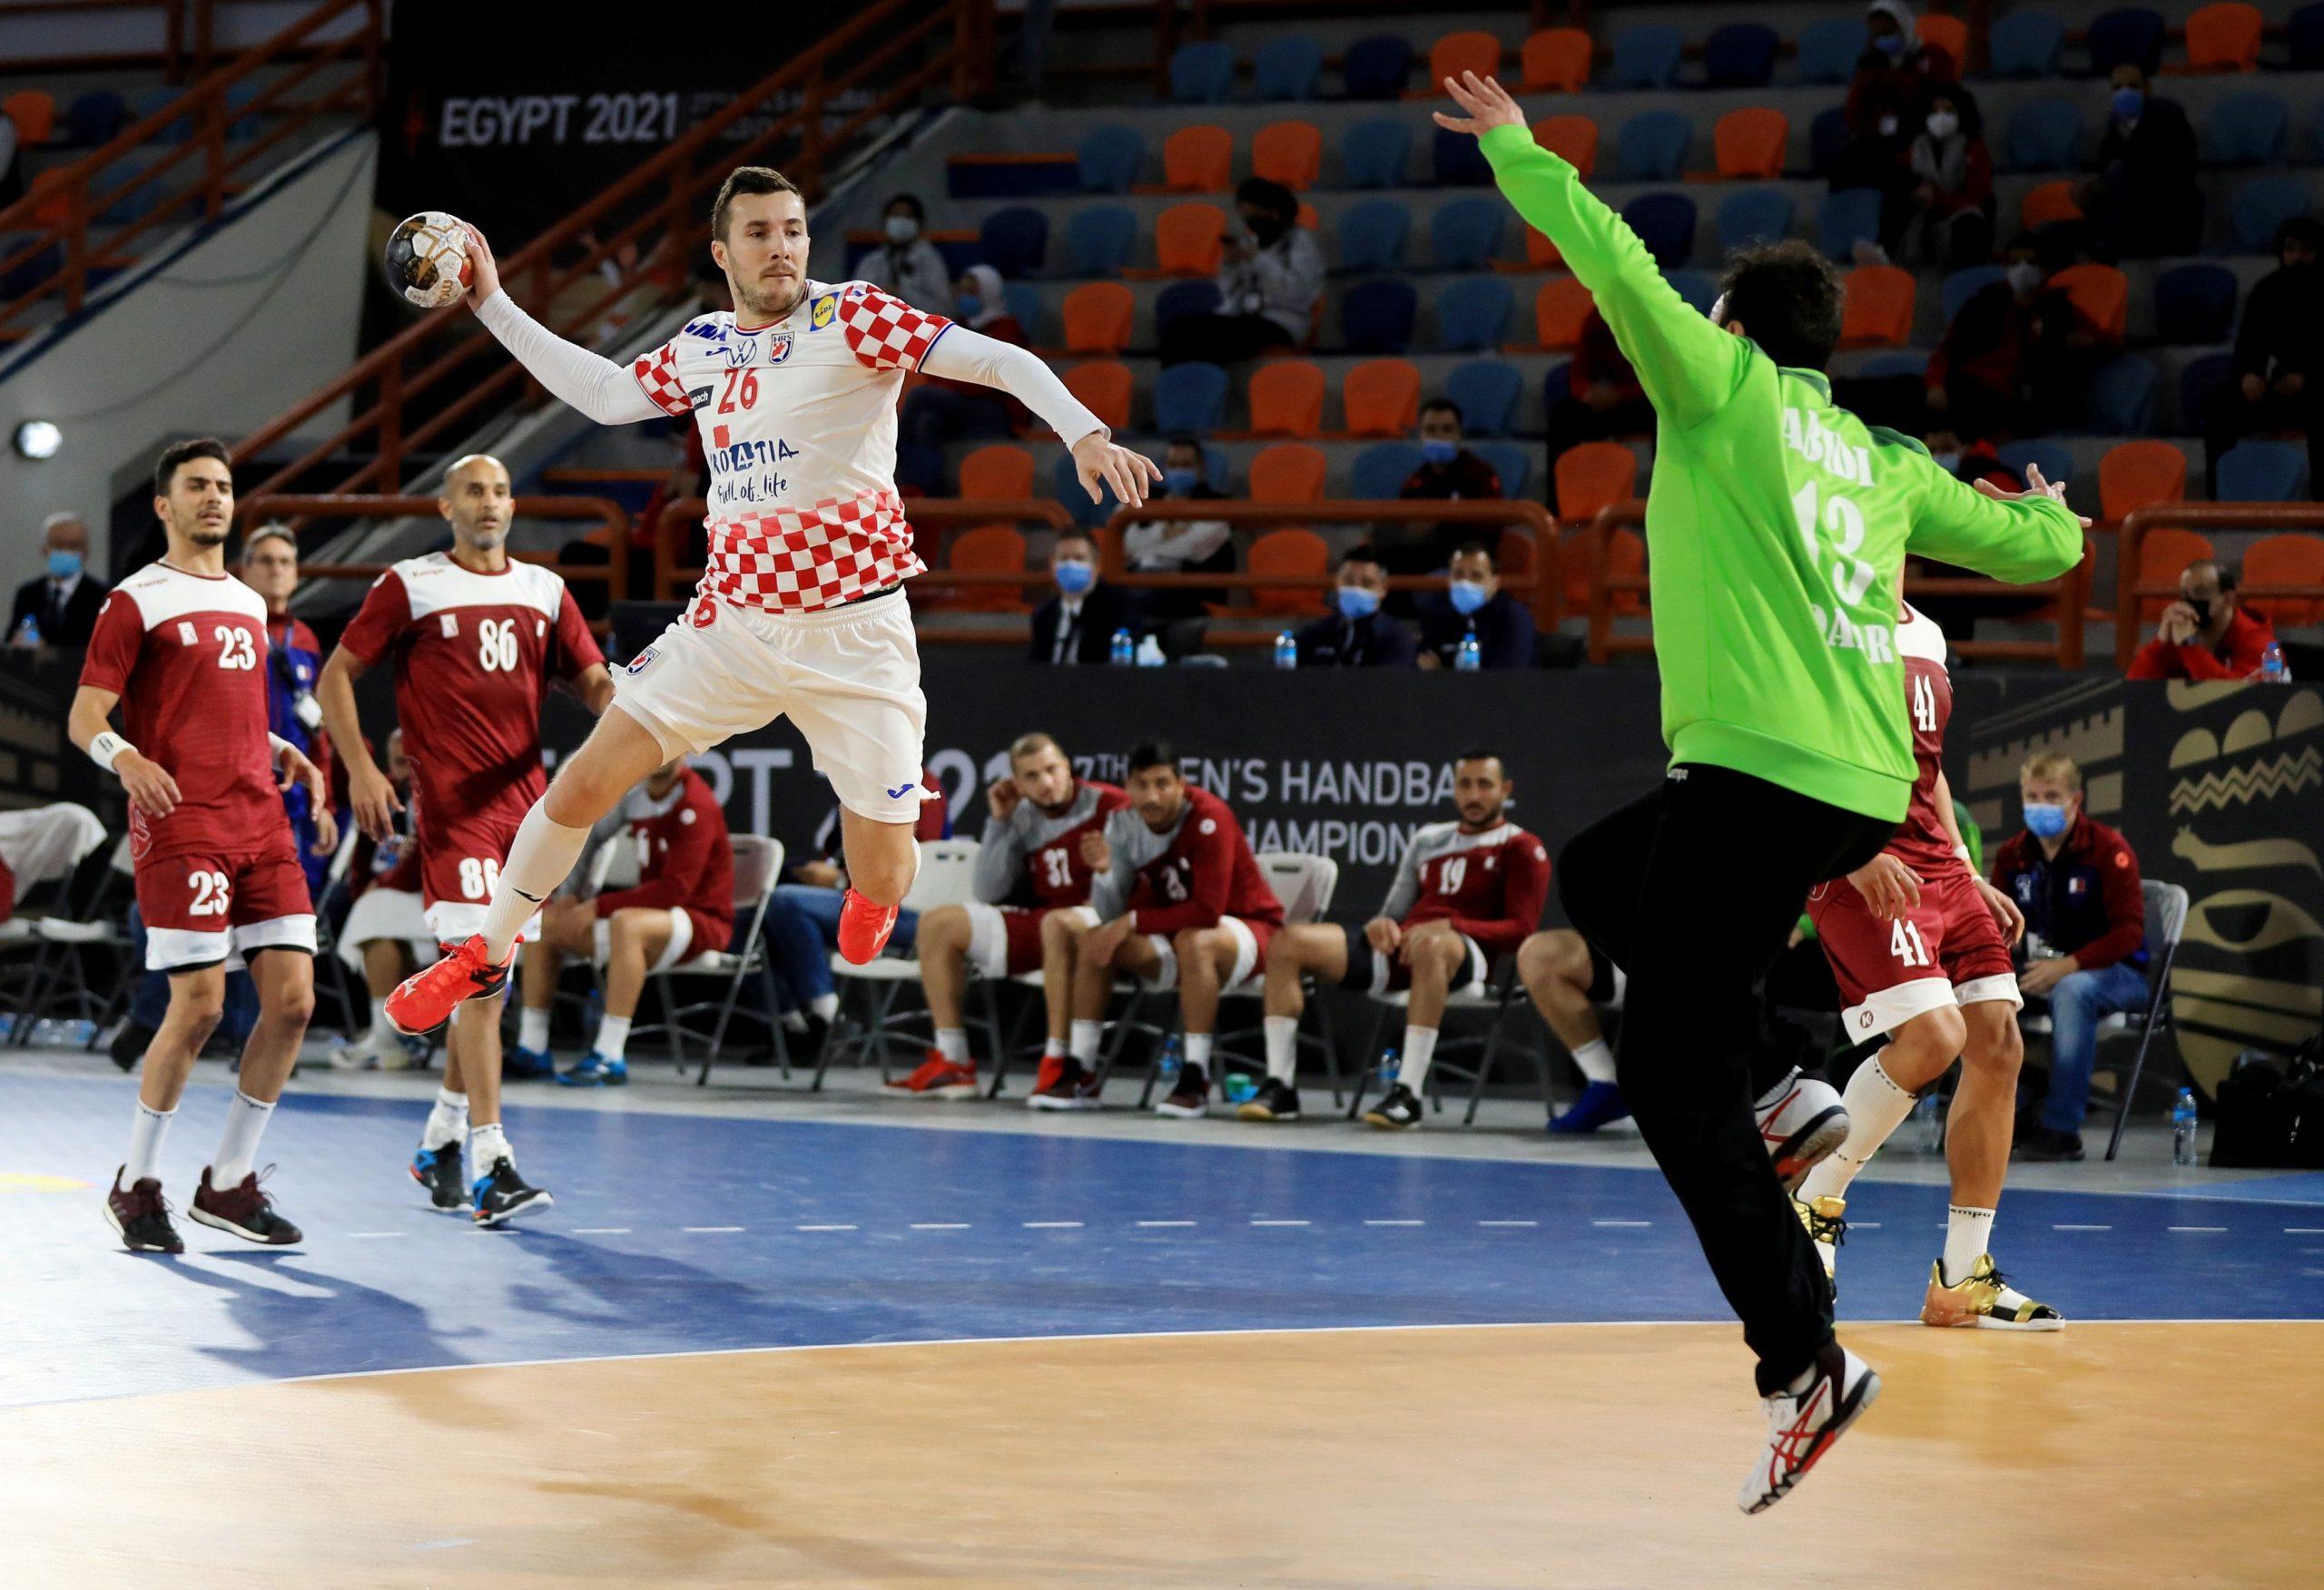 BEZ PODCJENJIVANJA - Manuel Štrlek/Foto REUTERS